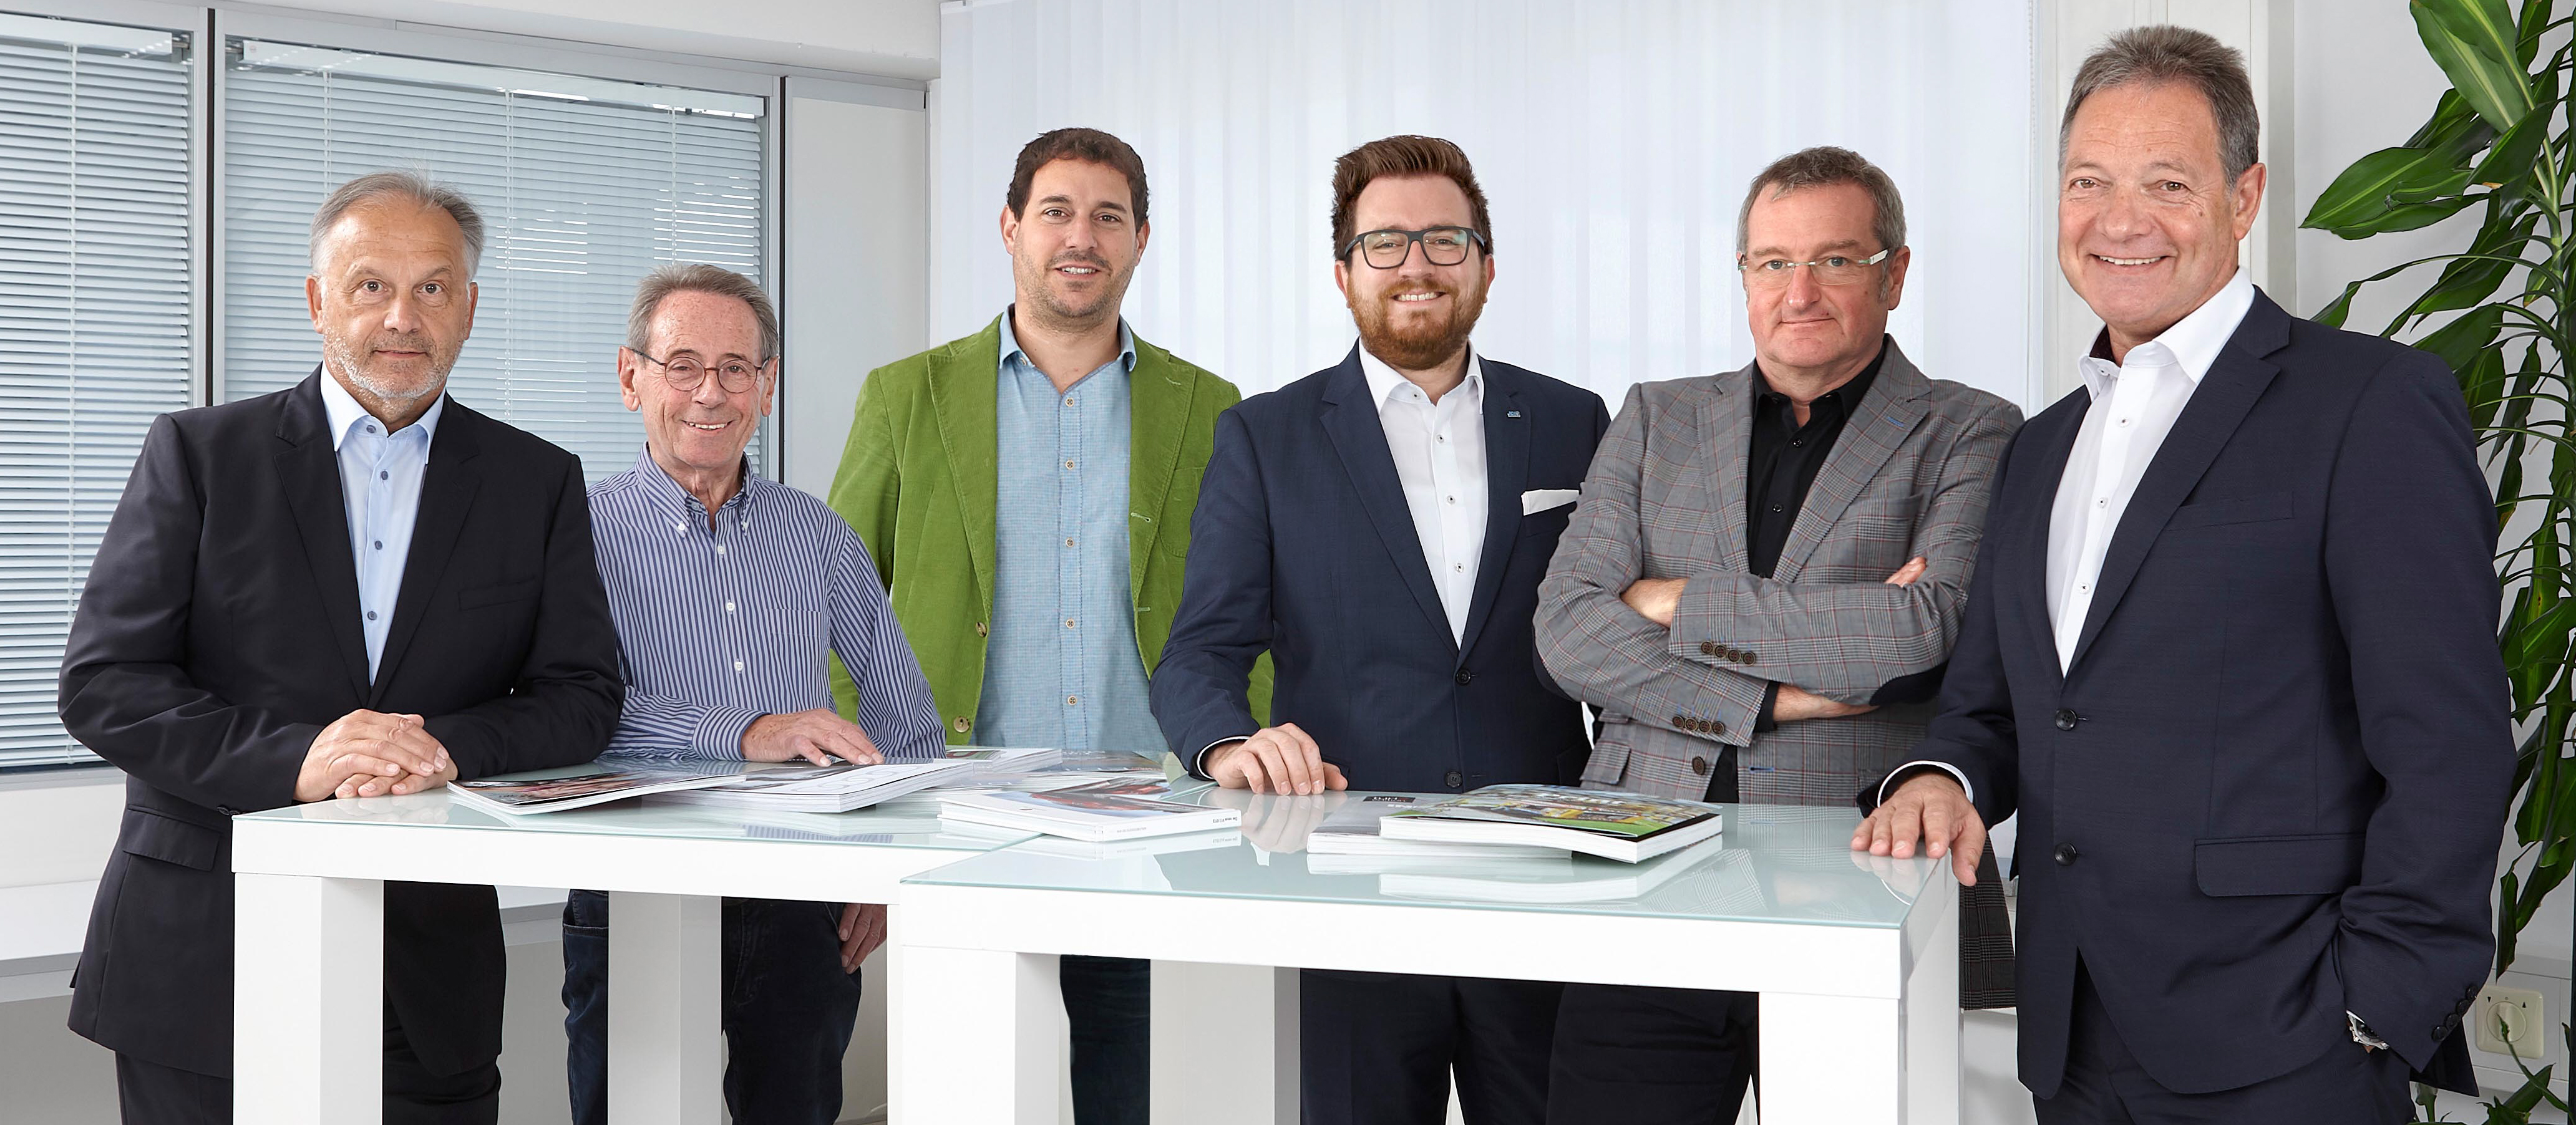 Erweiterte Geschäftsleitung (v.l.): Reinhard Hornung, Ulrich Otterbach, Boris Kern, Daniel Stöck, Jürgen Schreiber, Otto Engelhard